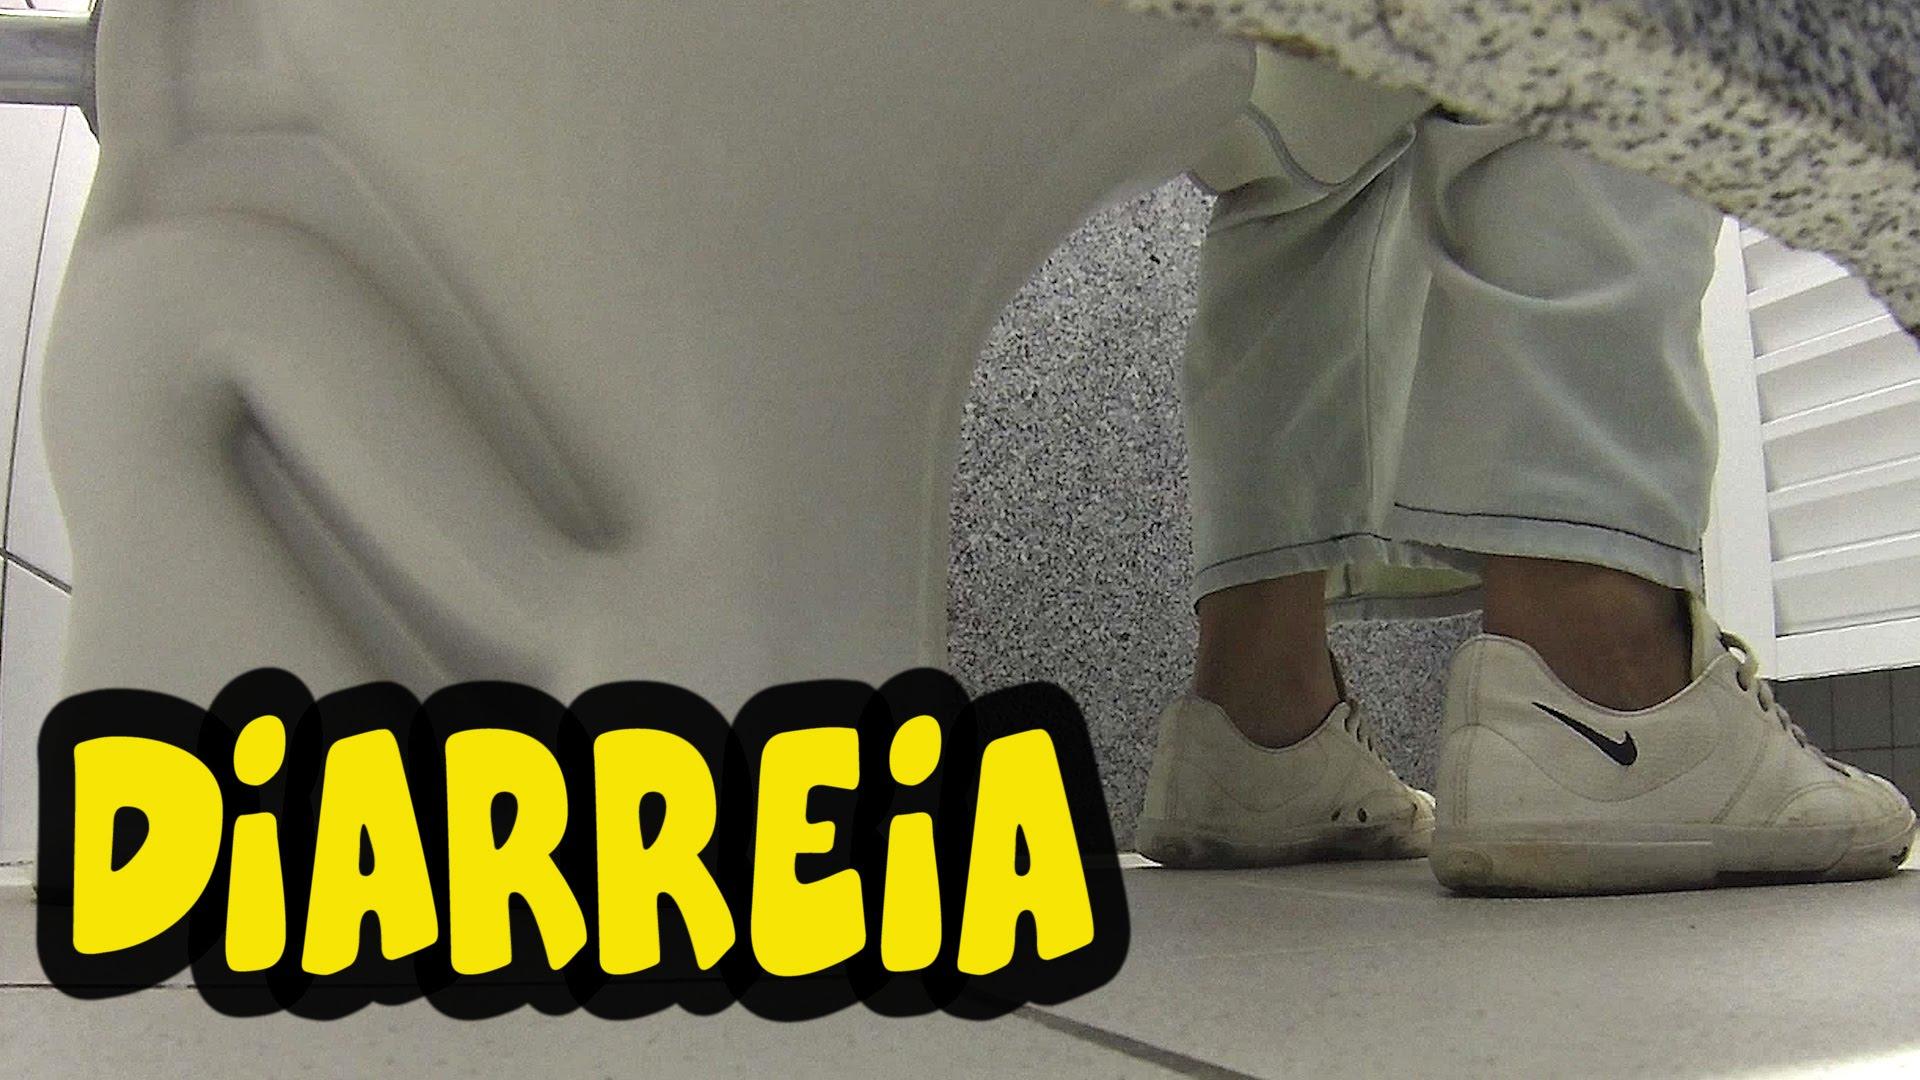 Pegadinha da diarréia no banheiro: vai dar merda! Ei Nerd #C7BA04 1920 1080